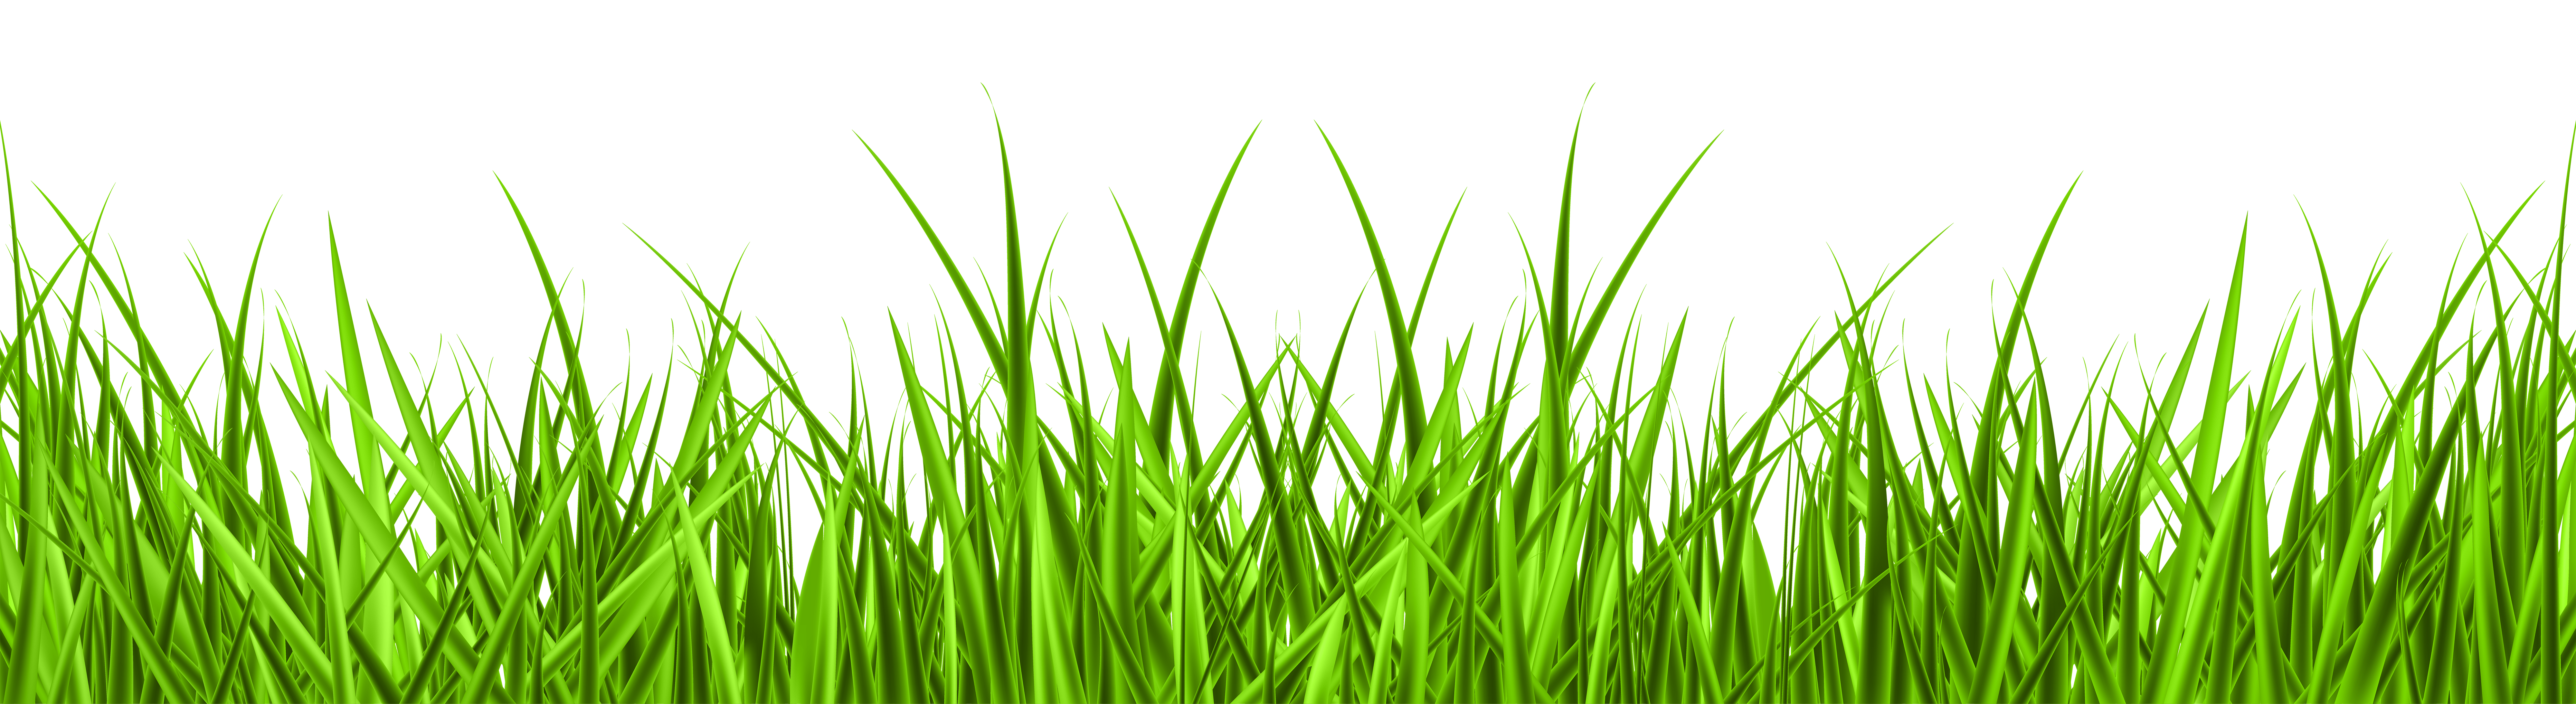 lawn grass clipart